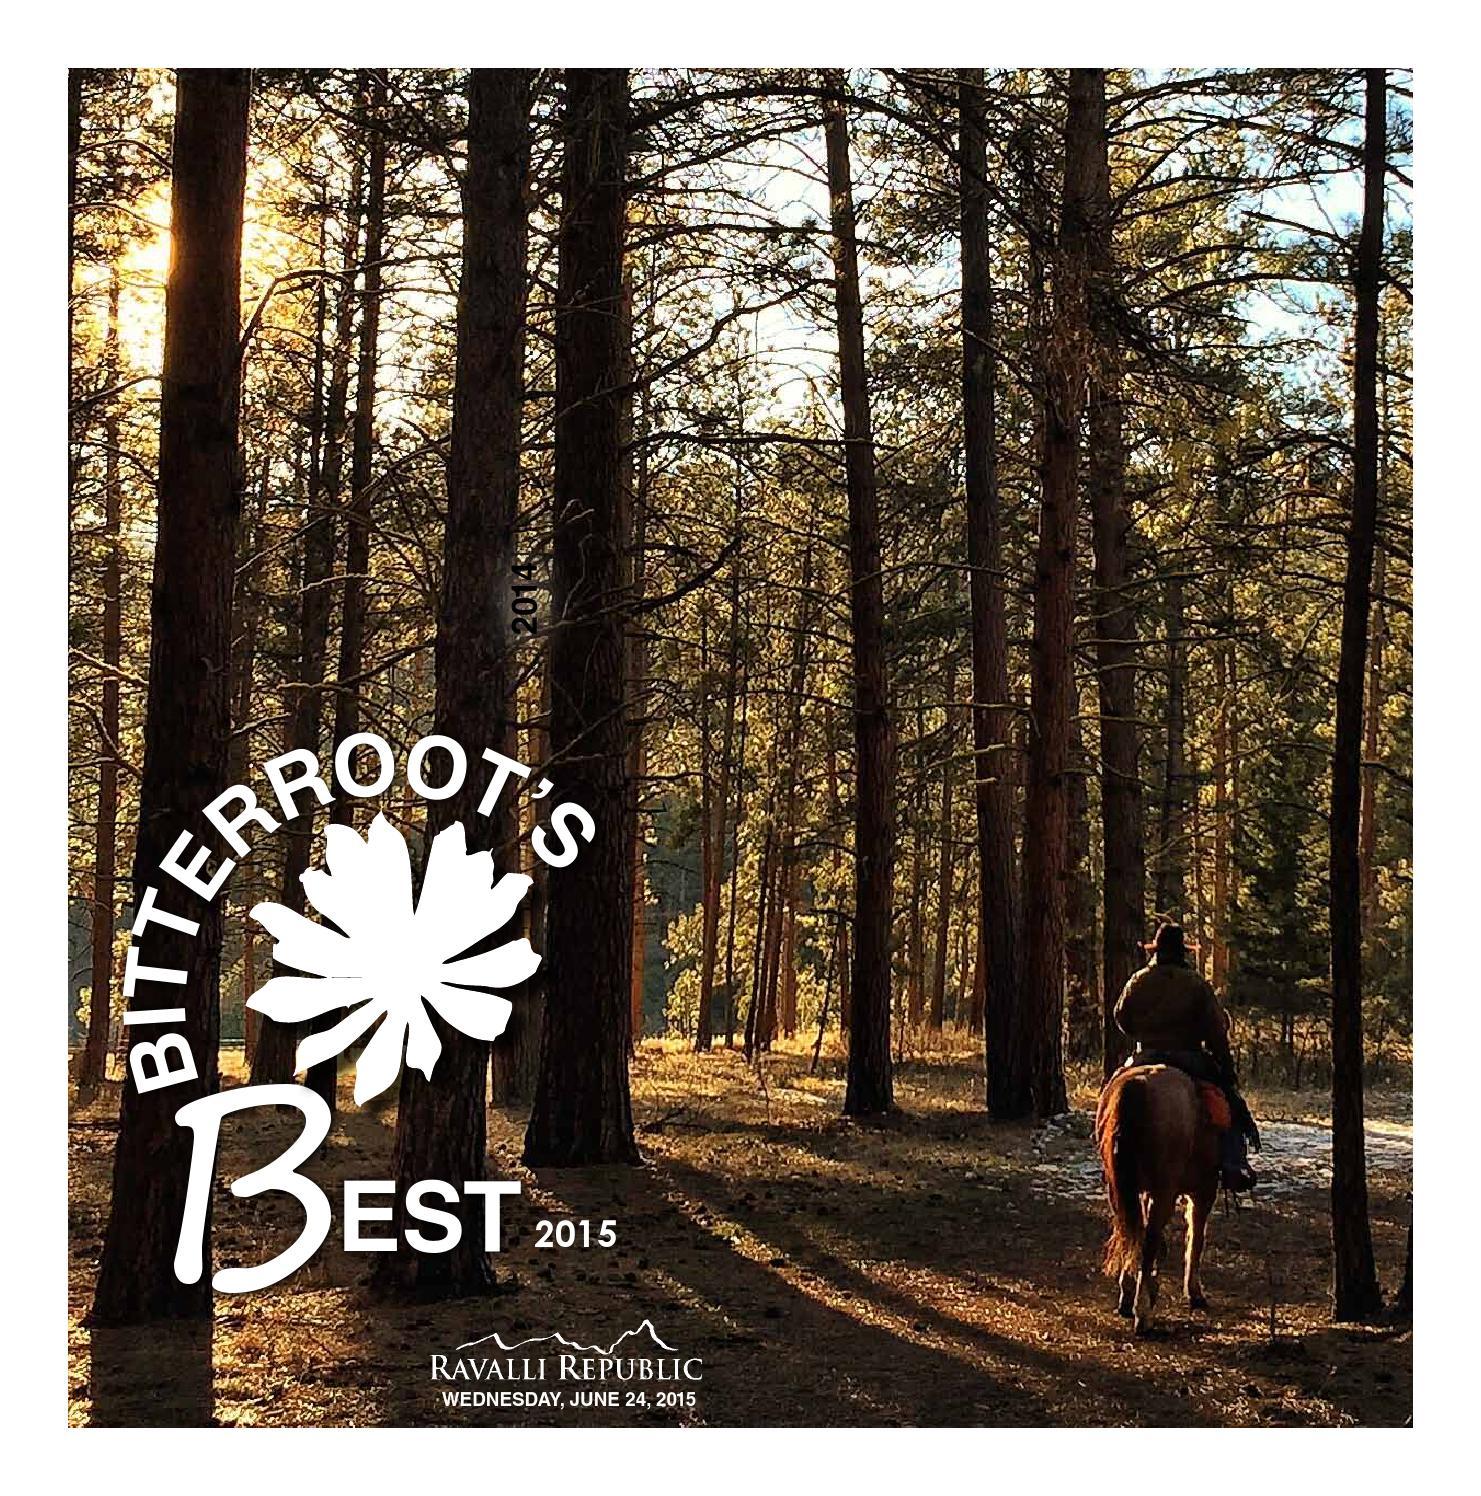 Bitterrootu0027s Best 2015 By Ravalli Republic   Issuu